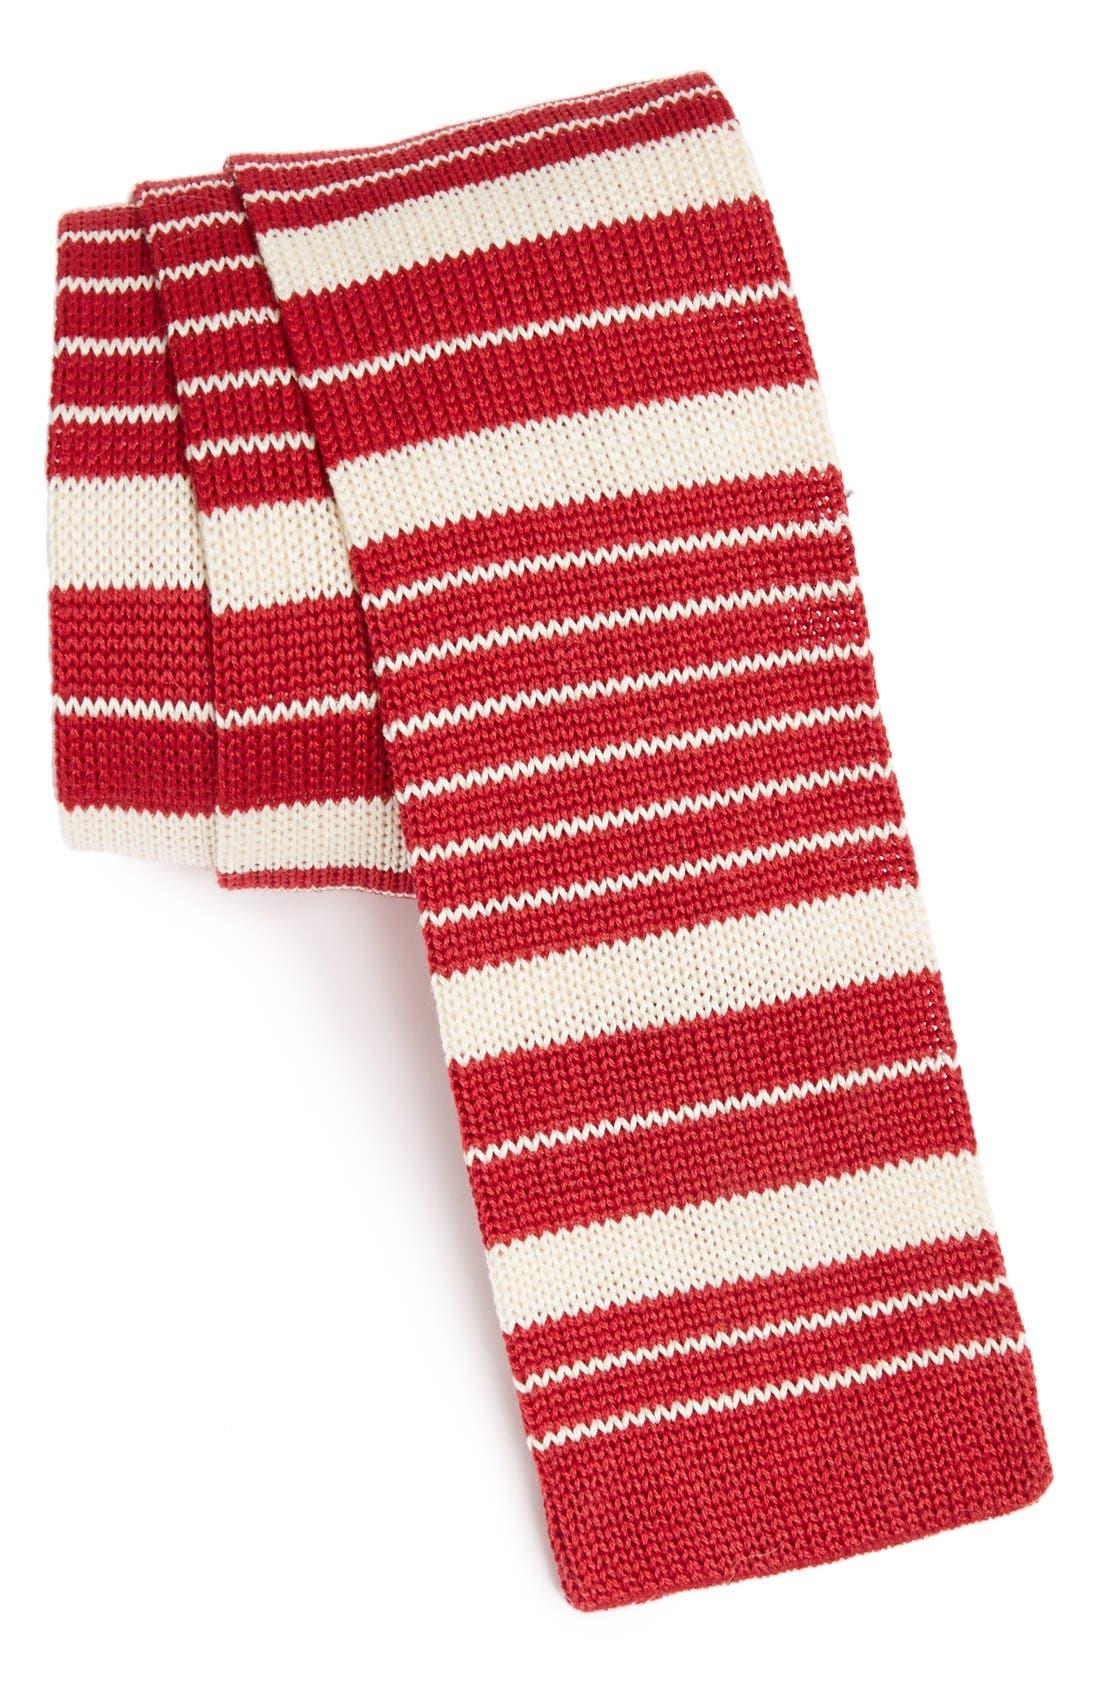 Alternate Image 1 Selected - IVY PREPSTER Stripe Knit Cotton Tie